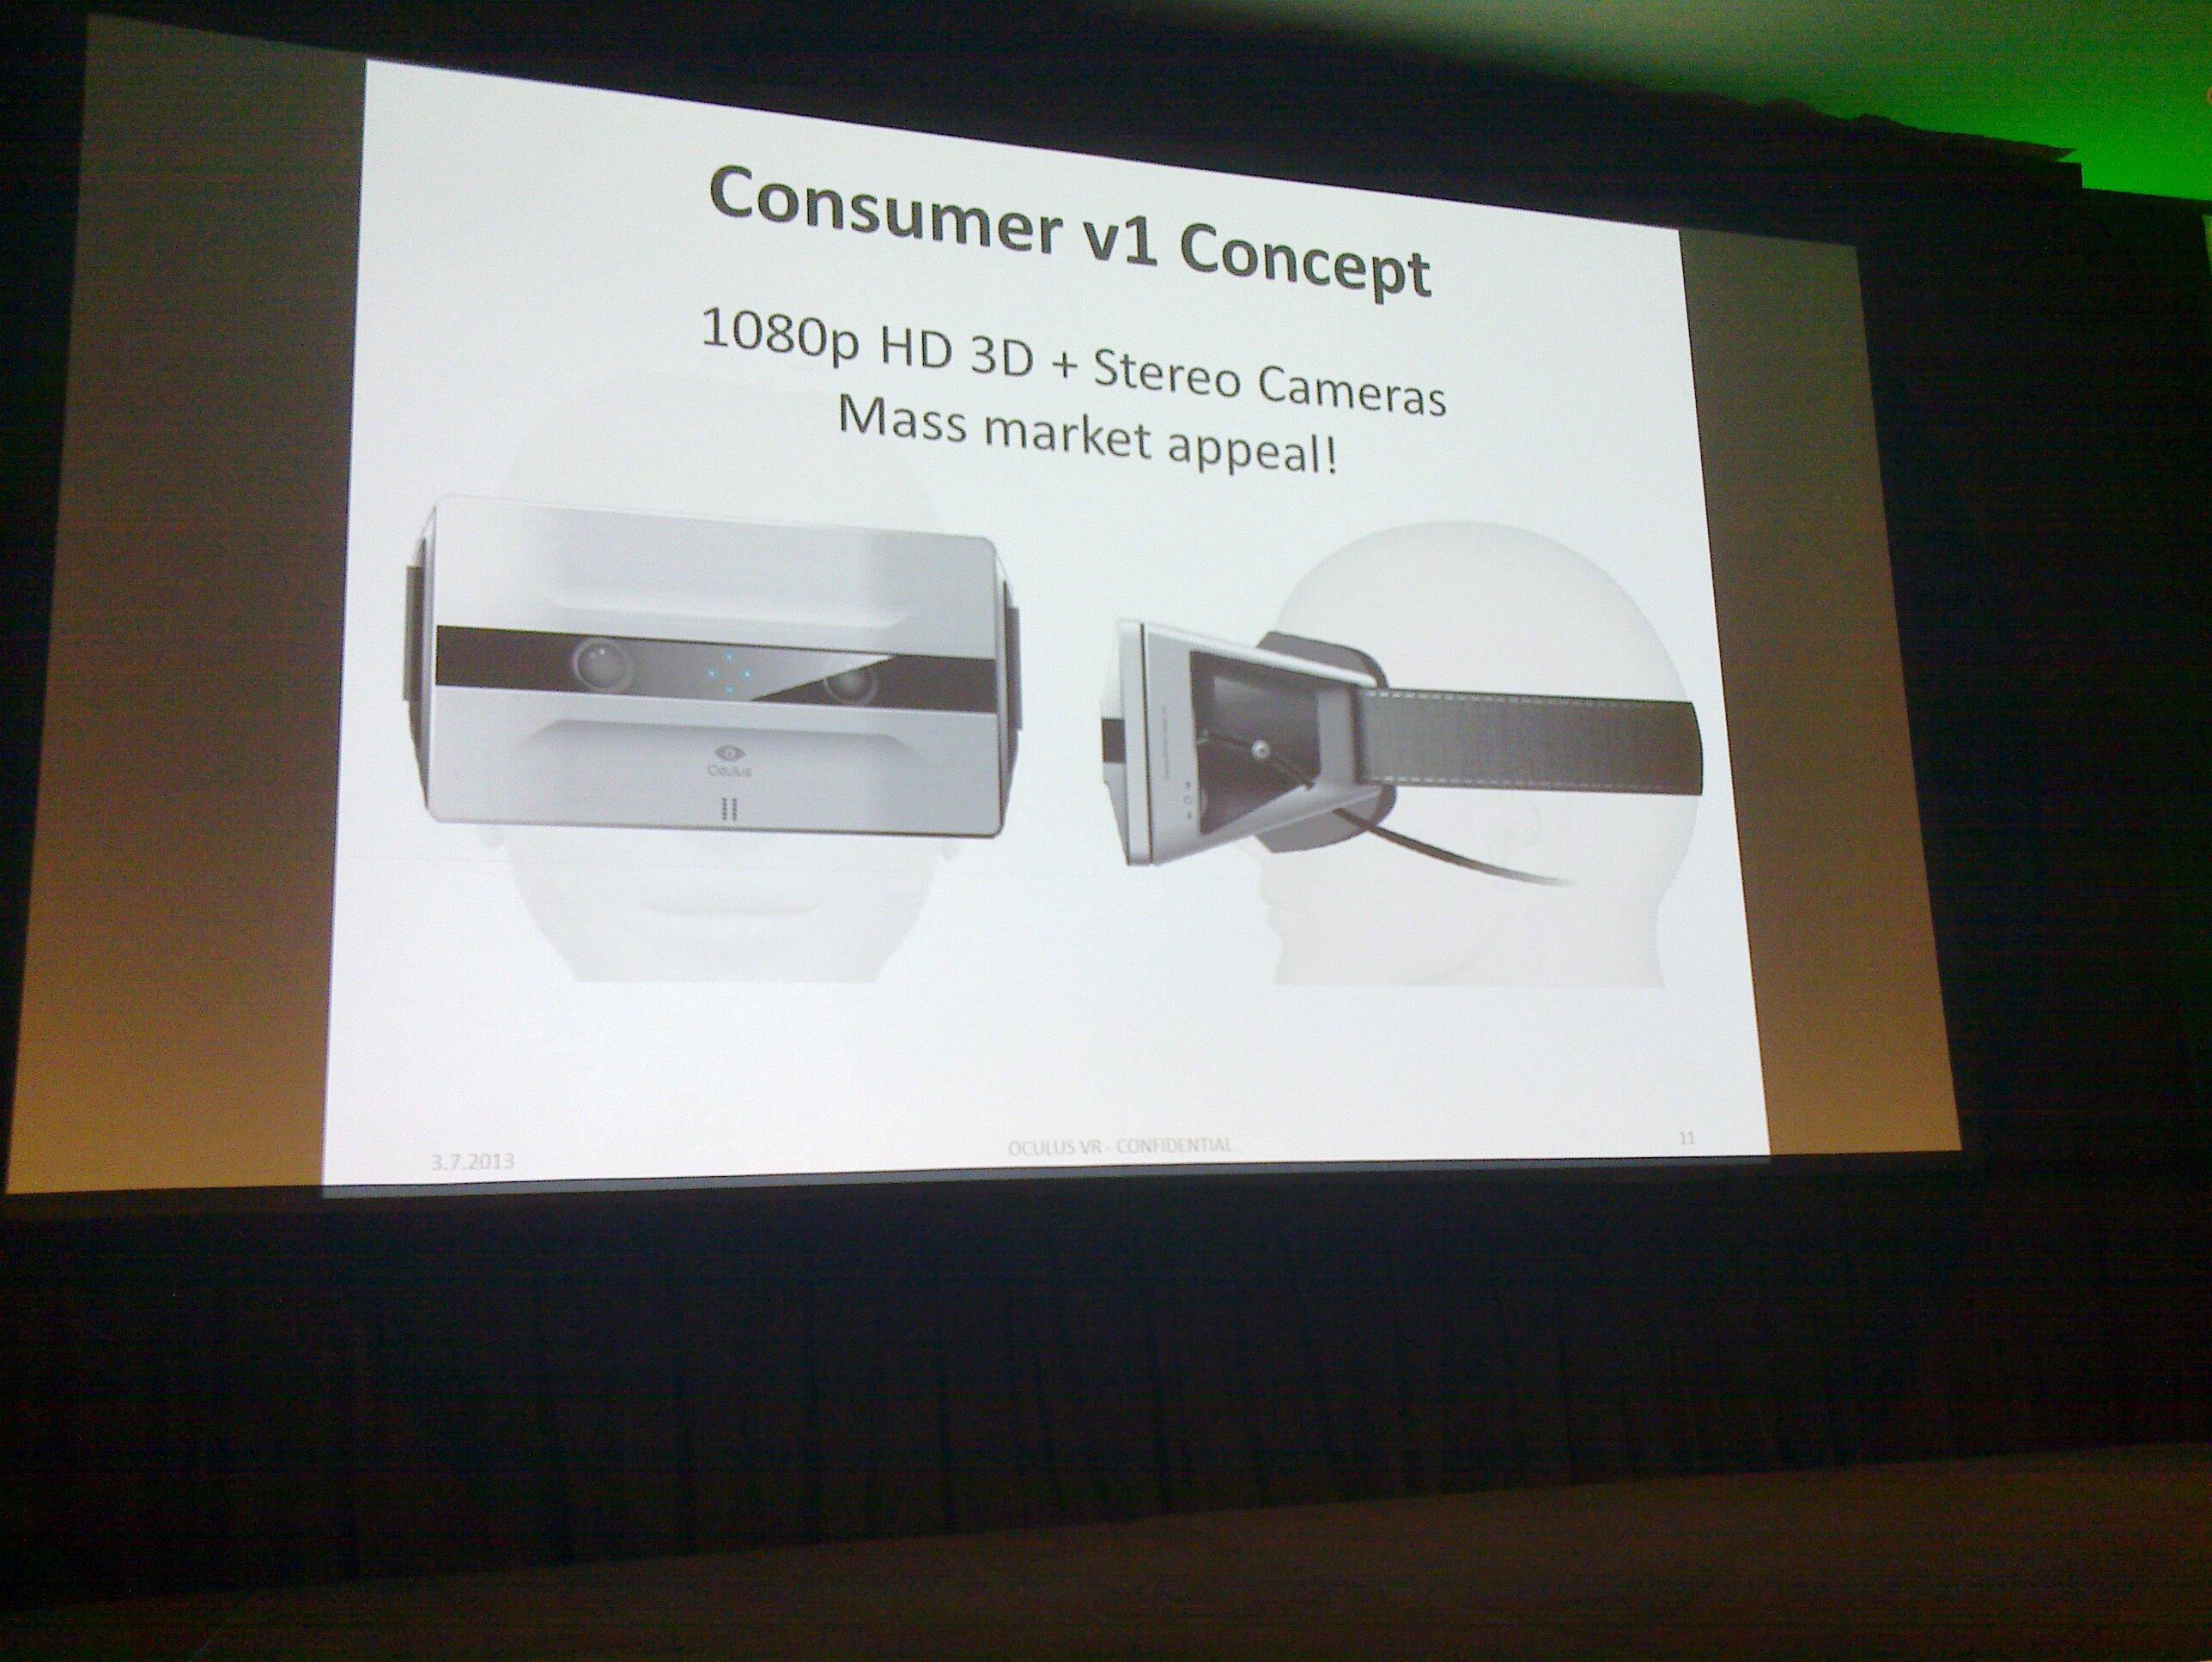 oculus-vr-emerging-companies-summit-gtc2013-6.jpg